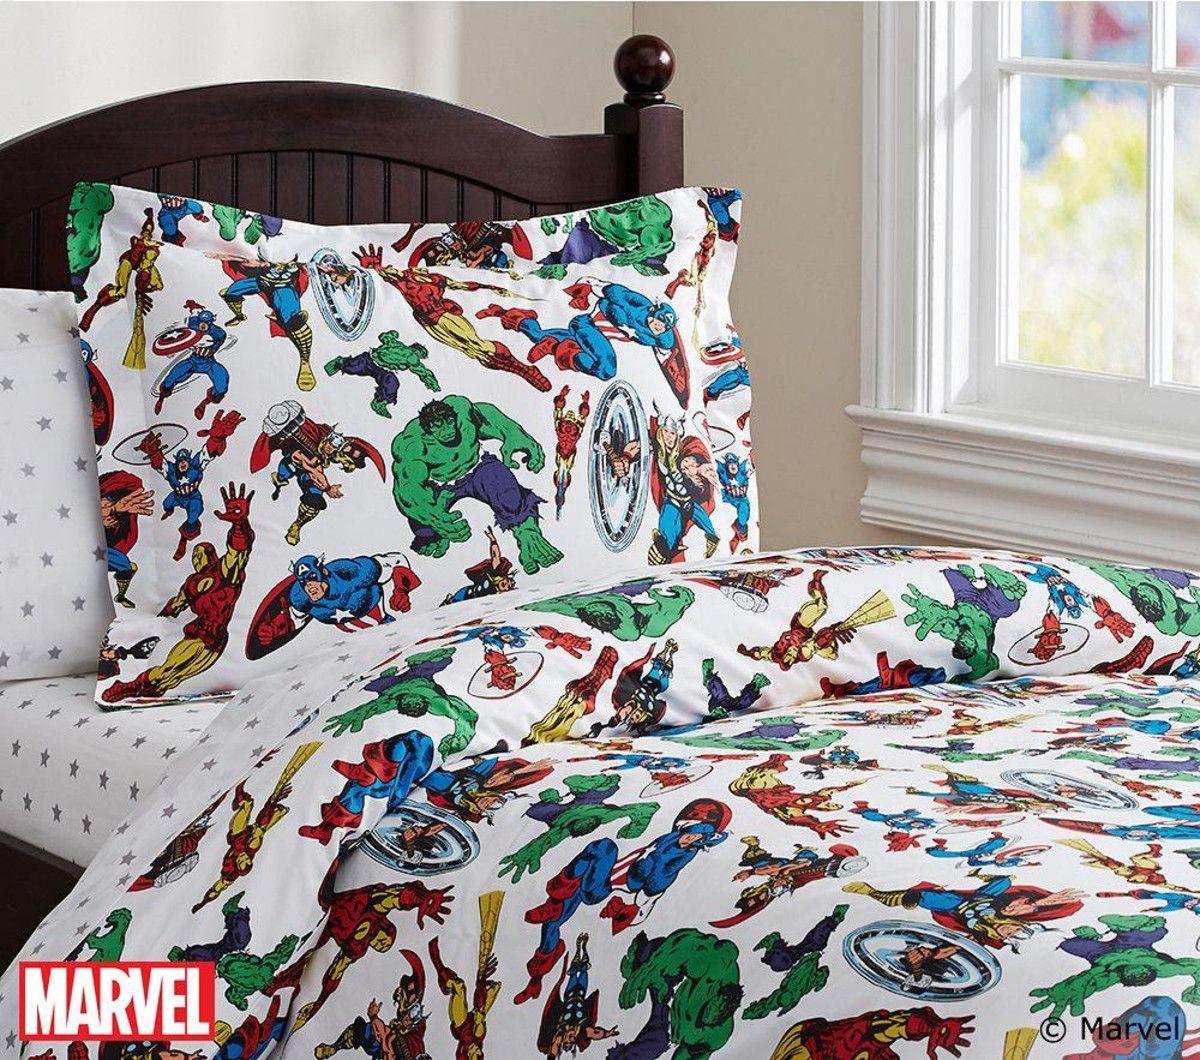 Avengers Quilt Cover